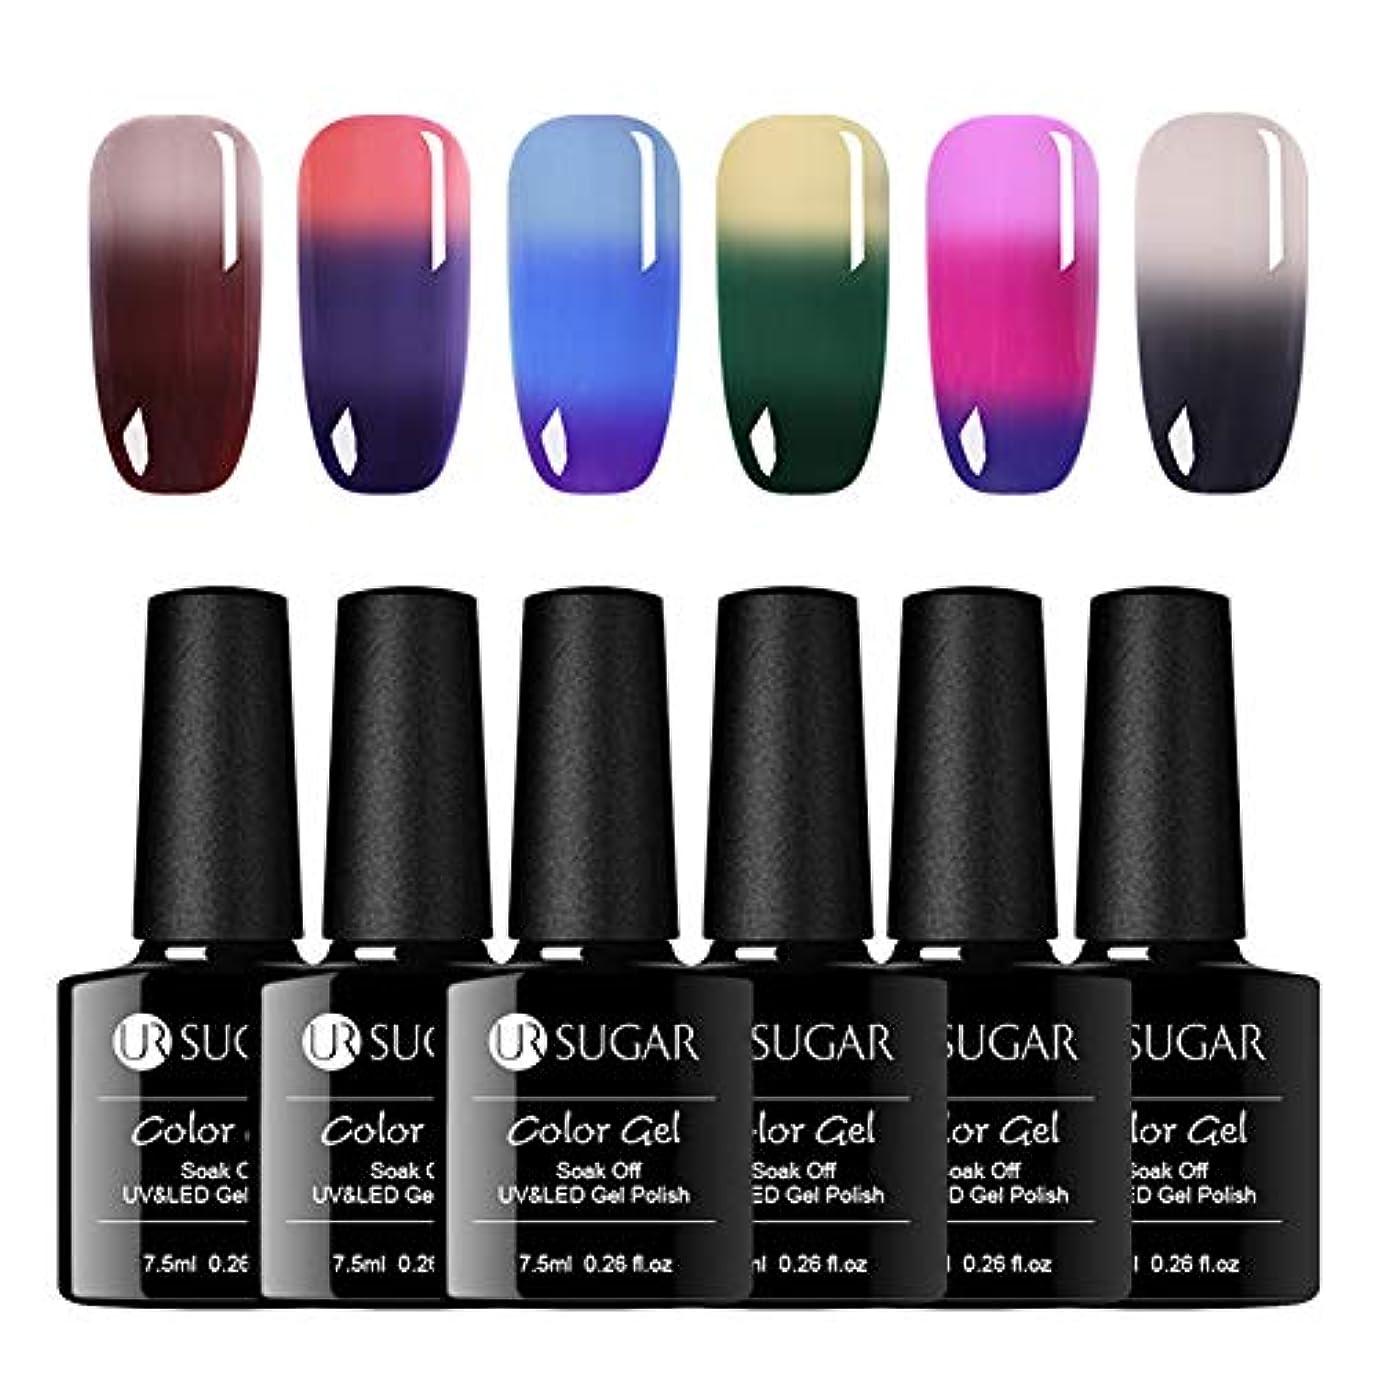 UR SUGAR カラージェルセット 温度で色が変わる 新型な3段階変色 7.5ml/本 【全6色セット】 カメレオンネイル UV/LED対応 ジェルネイル カラージェル [並行輸入品]